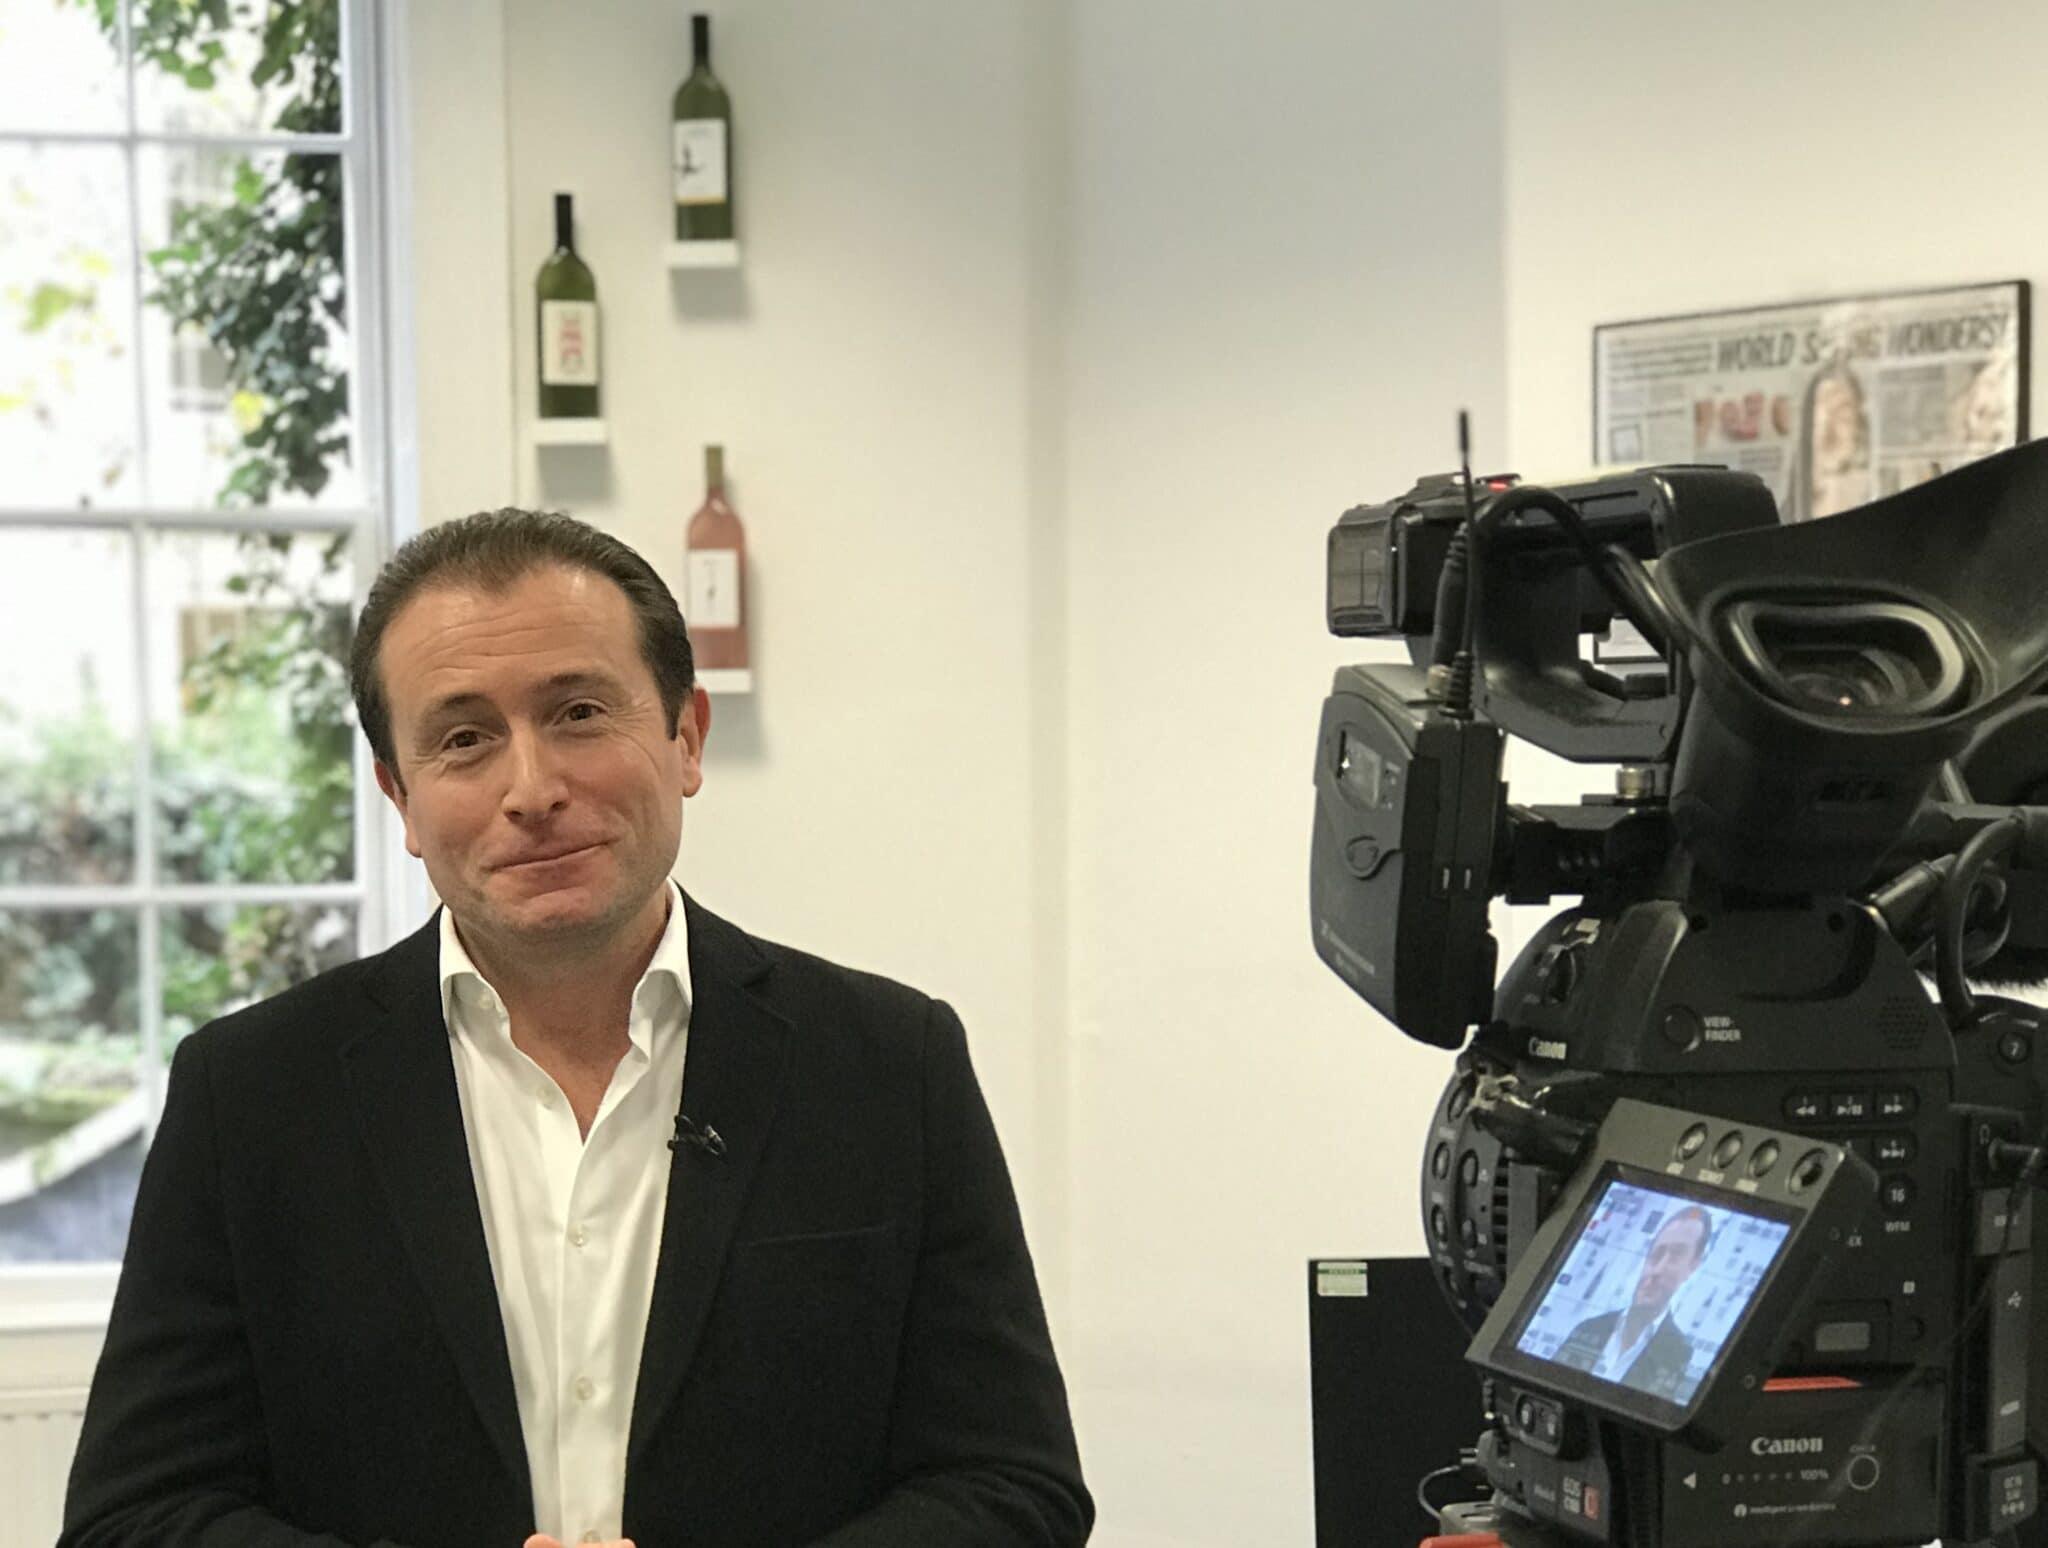 Santiago Navarro Garçon Wines